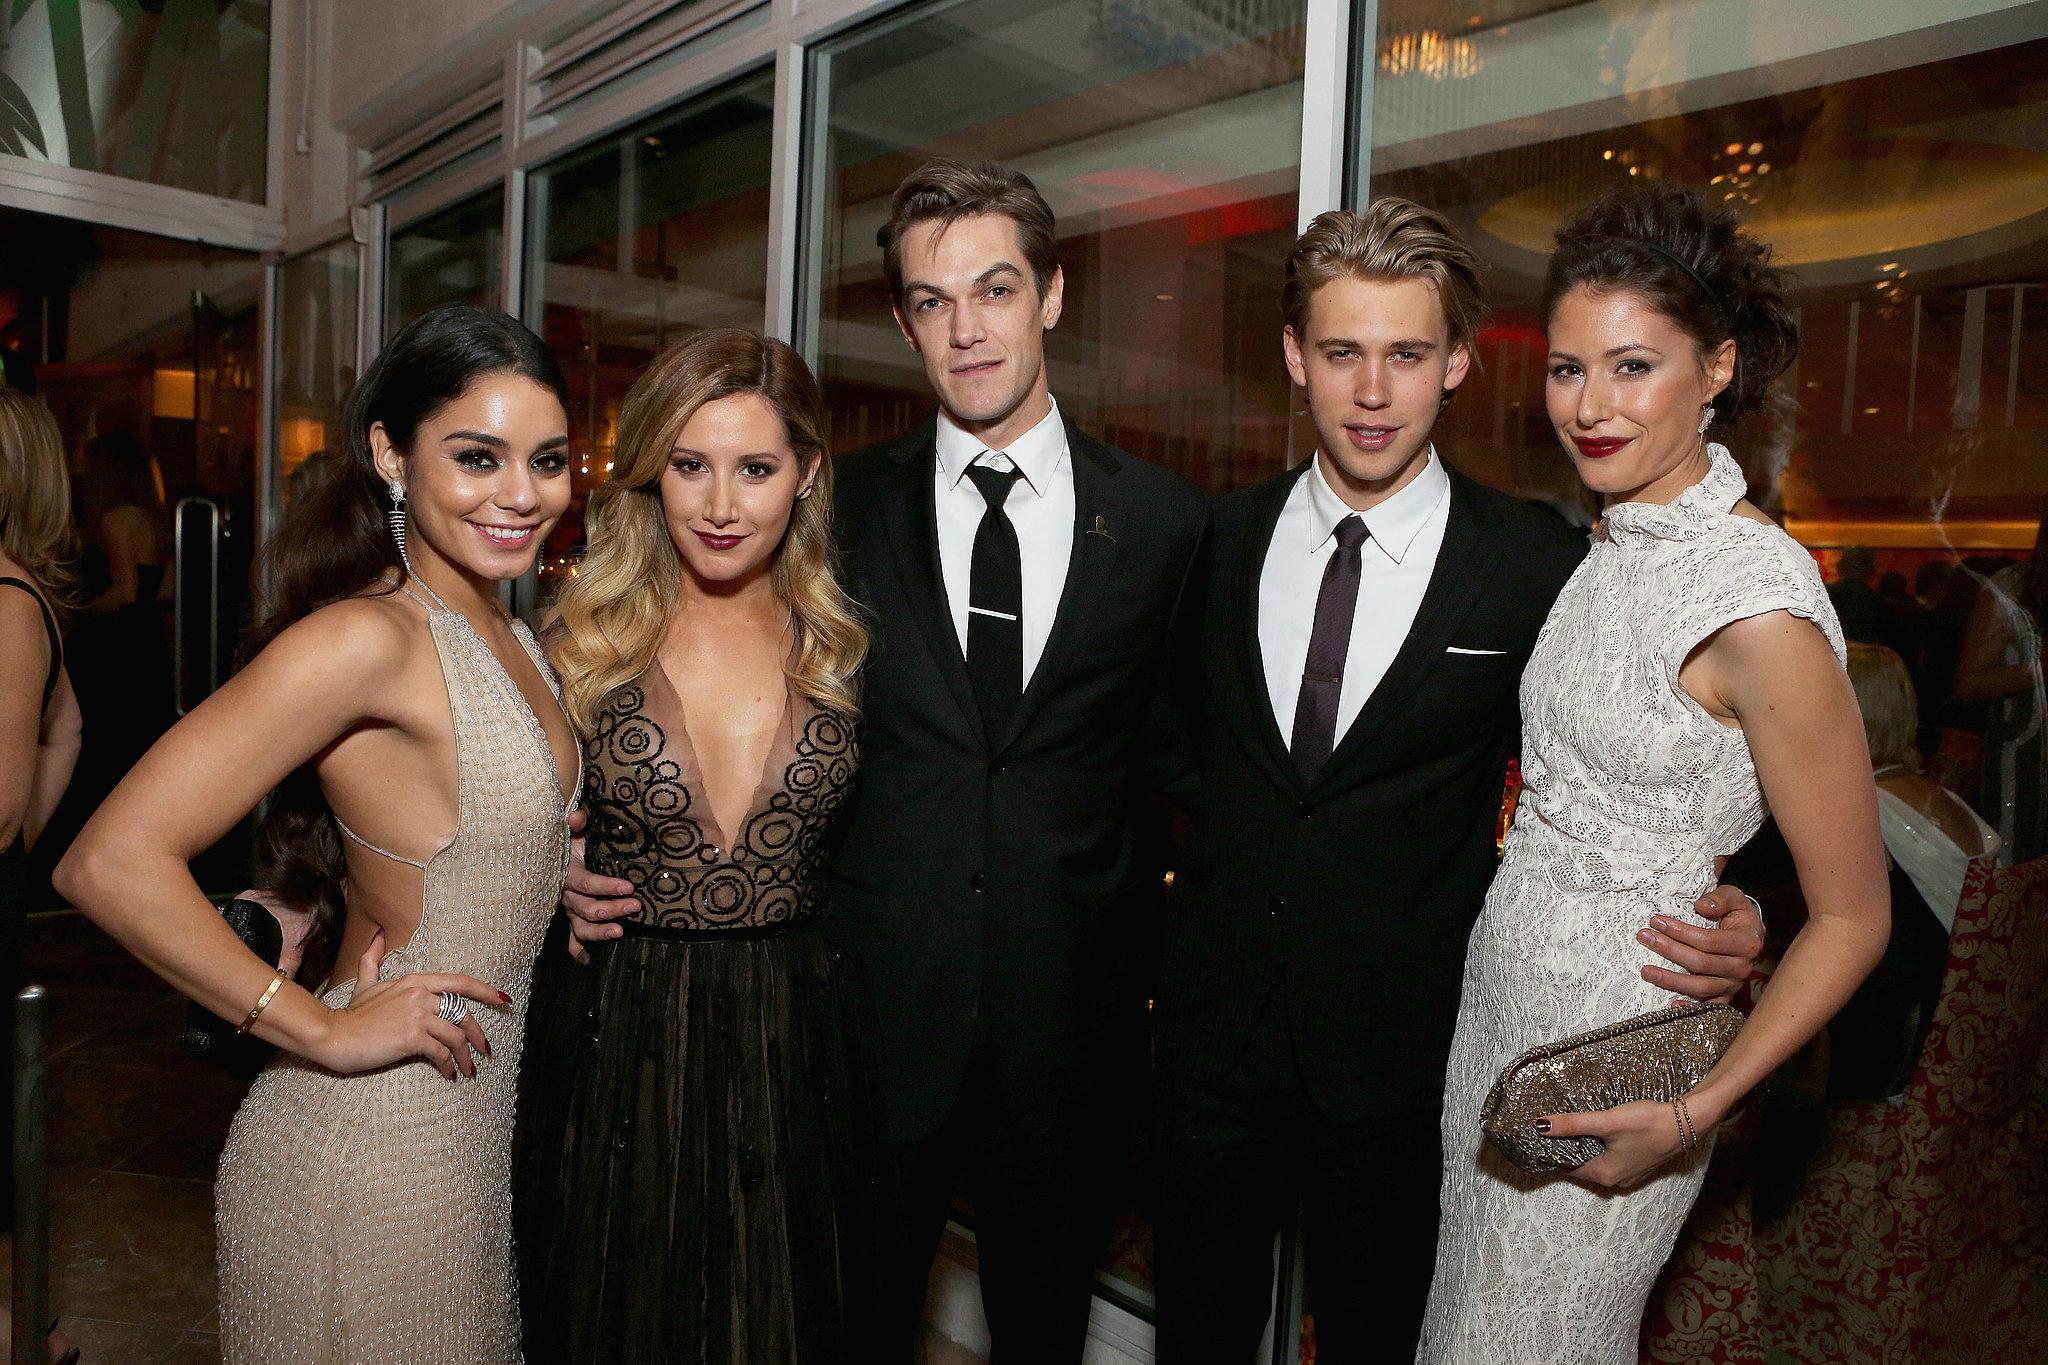 Vanessa Hudgens, Ashley Tisdale, Chris French, and Austin Butler met up inside.